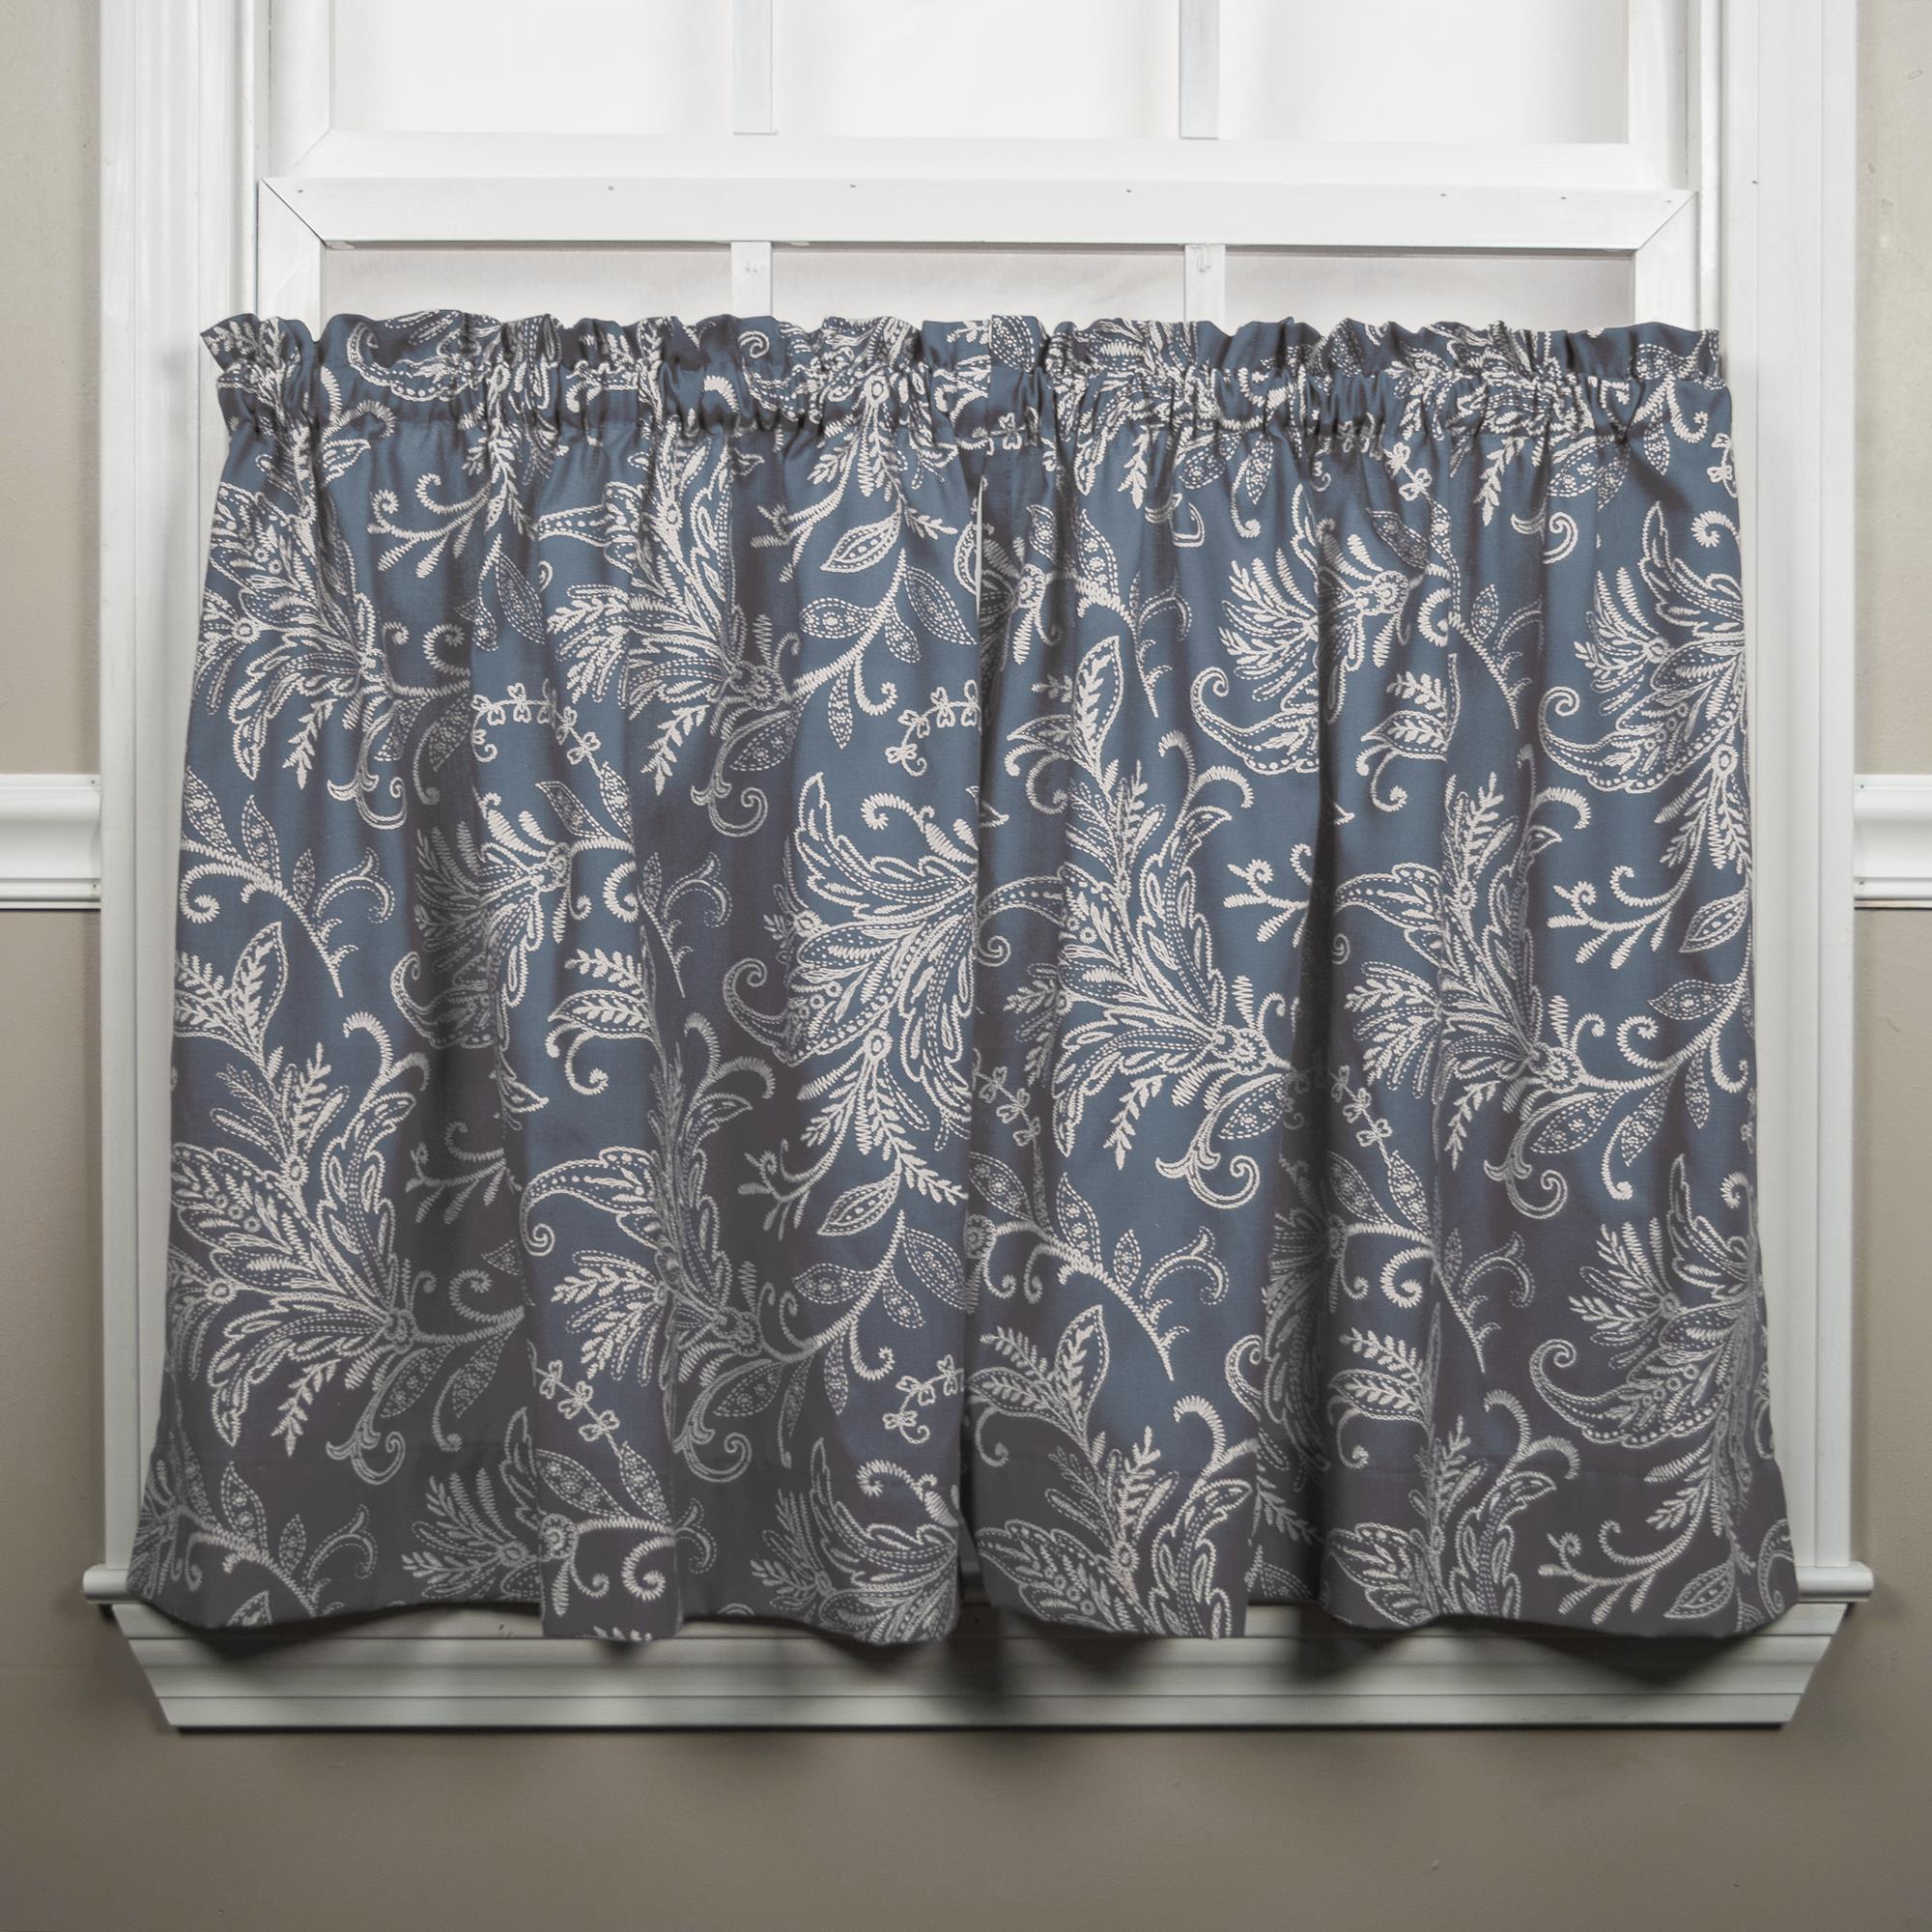 Ellis Curtain Tuscany Lined Grommet Panel 50 x 63 Blue A.L Ellis 730462118295